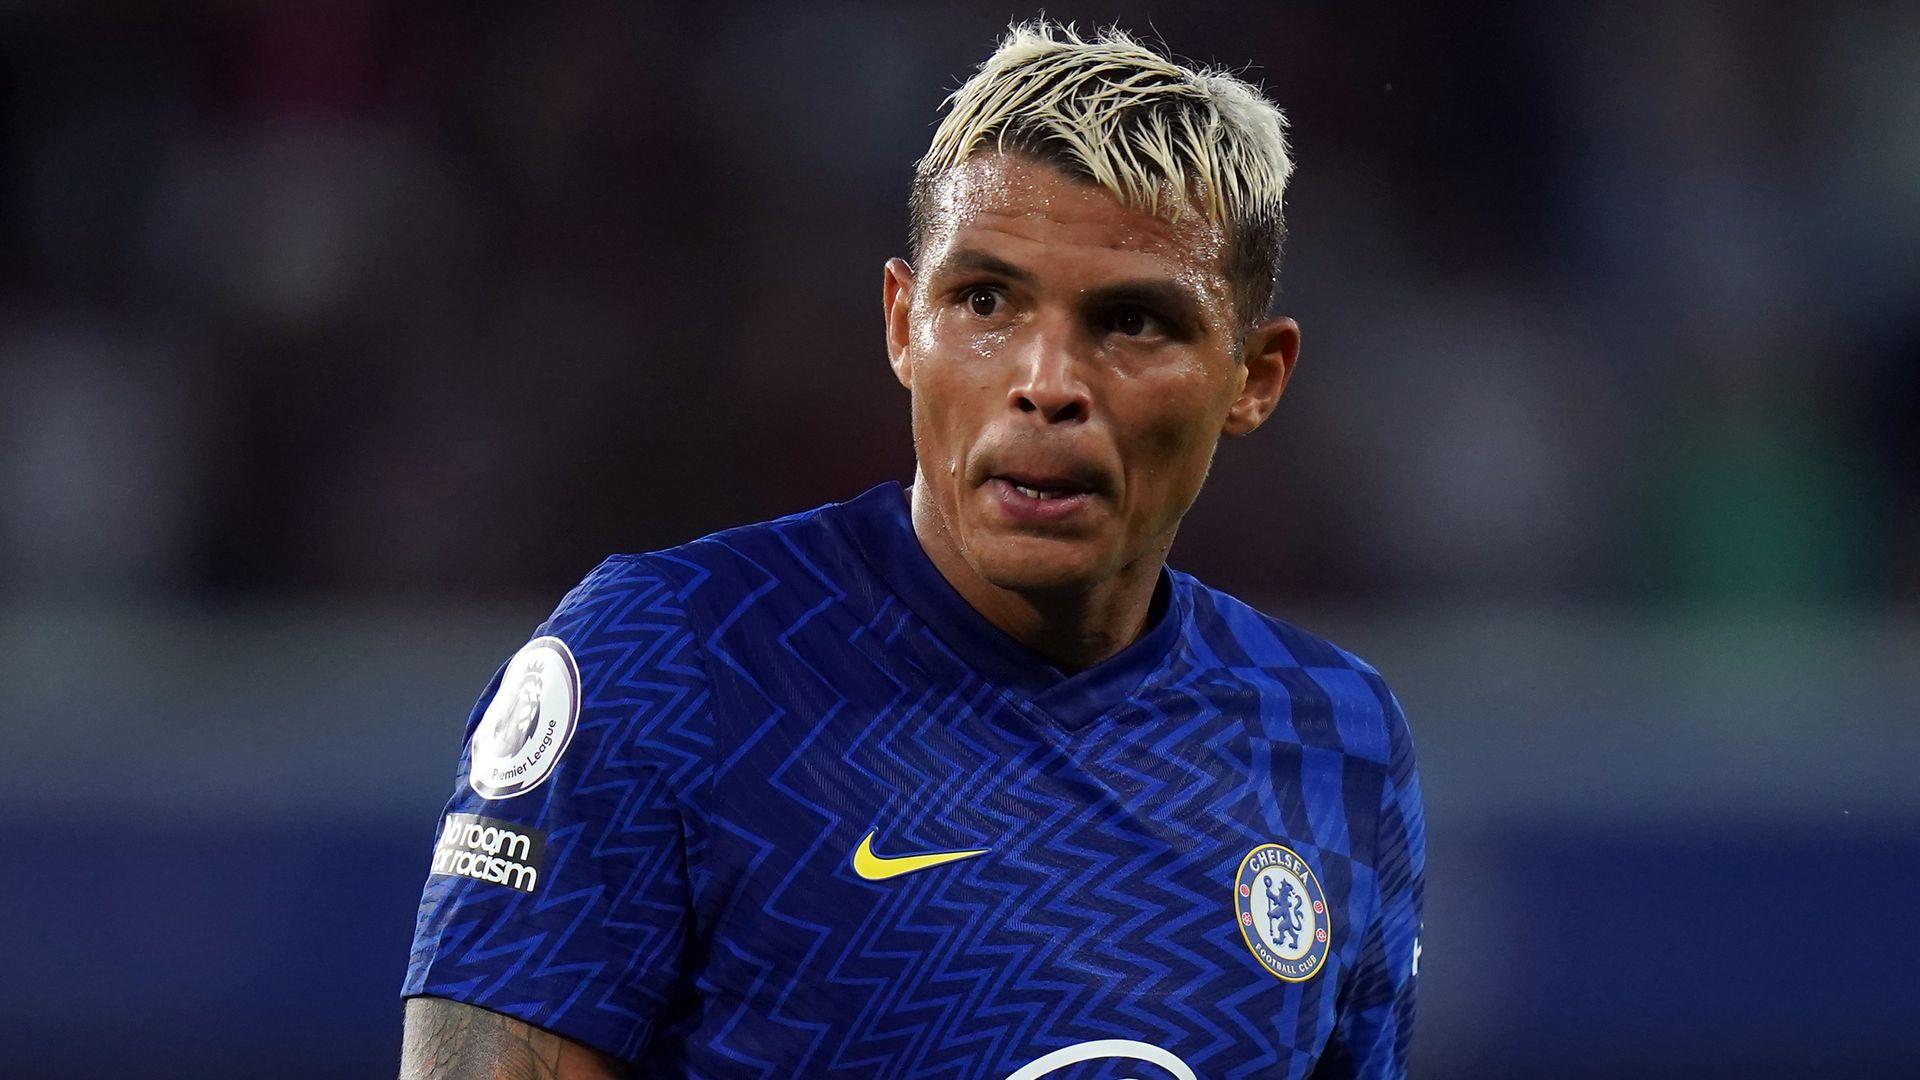 Chelsea vs Malmo preview: Silva, Rudiger available